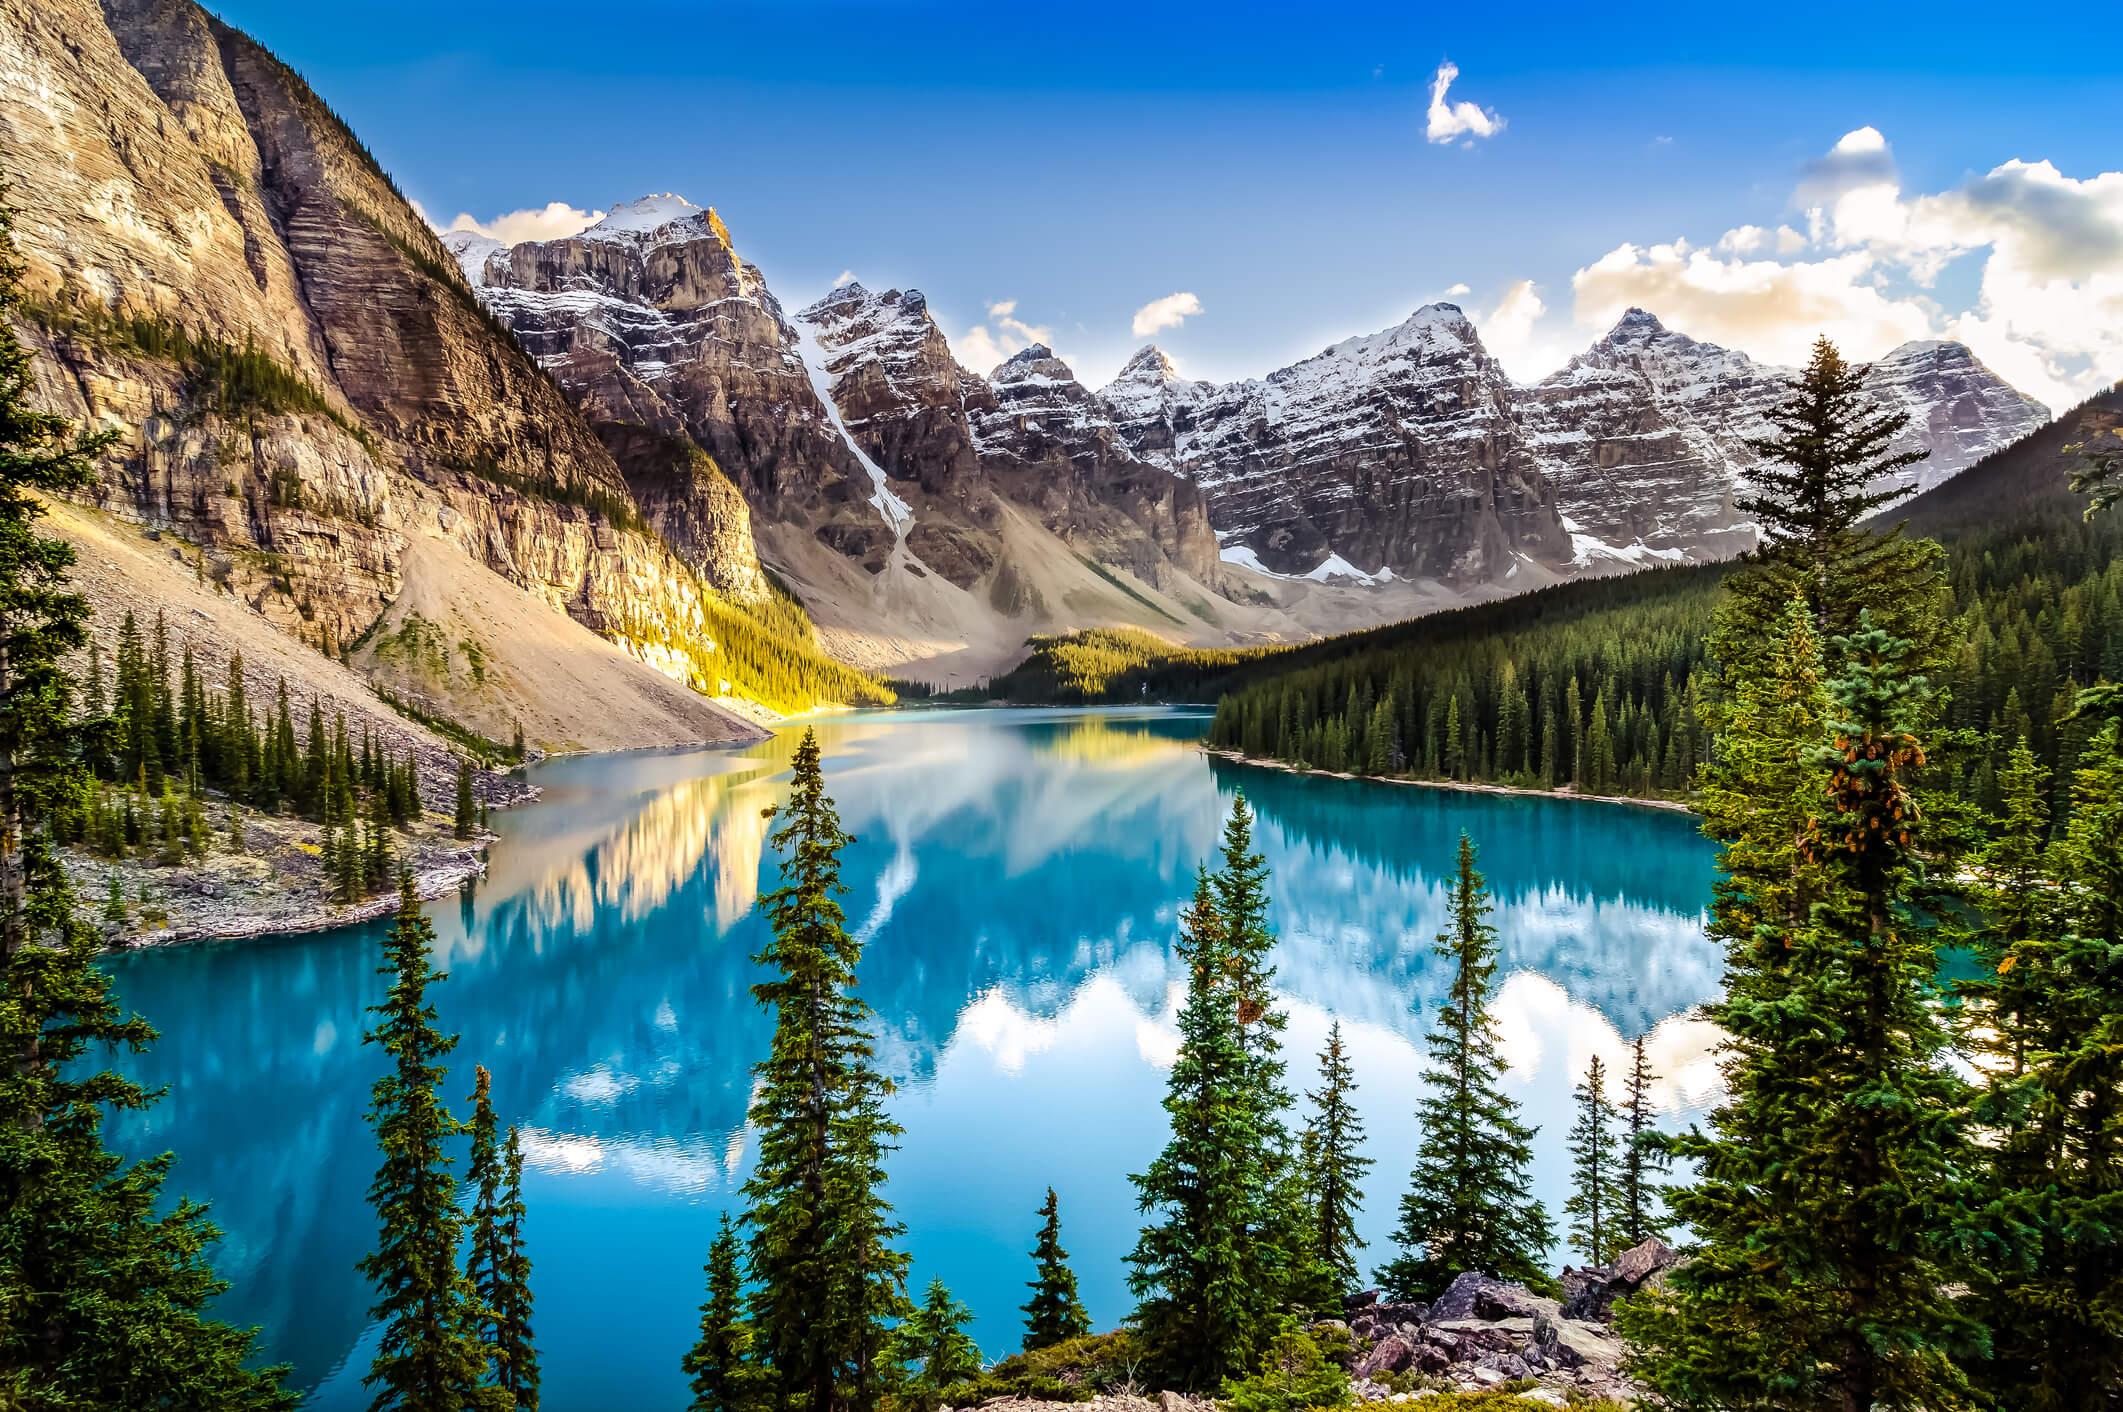 parque nacional banff canada